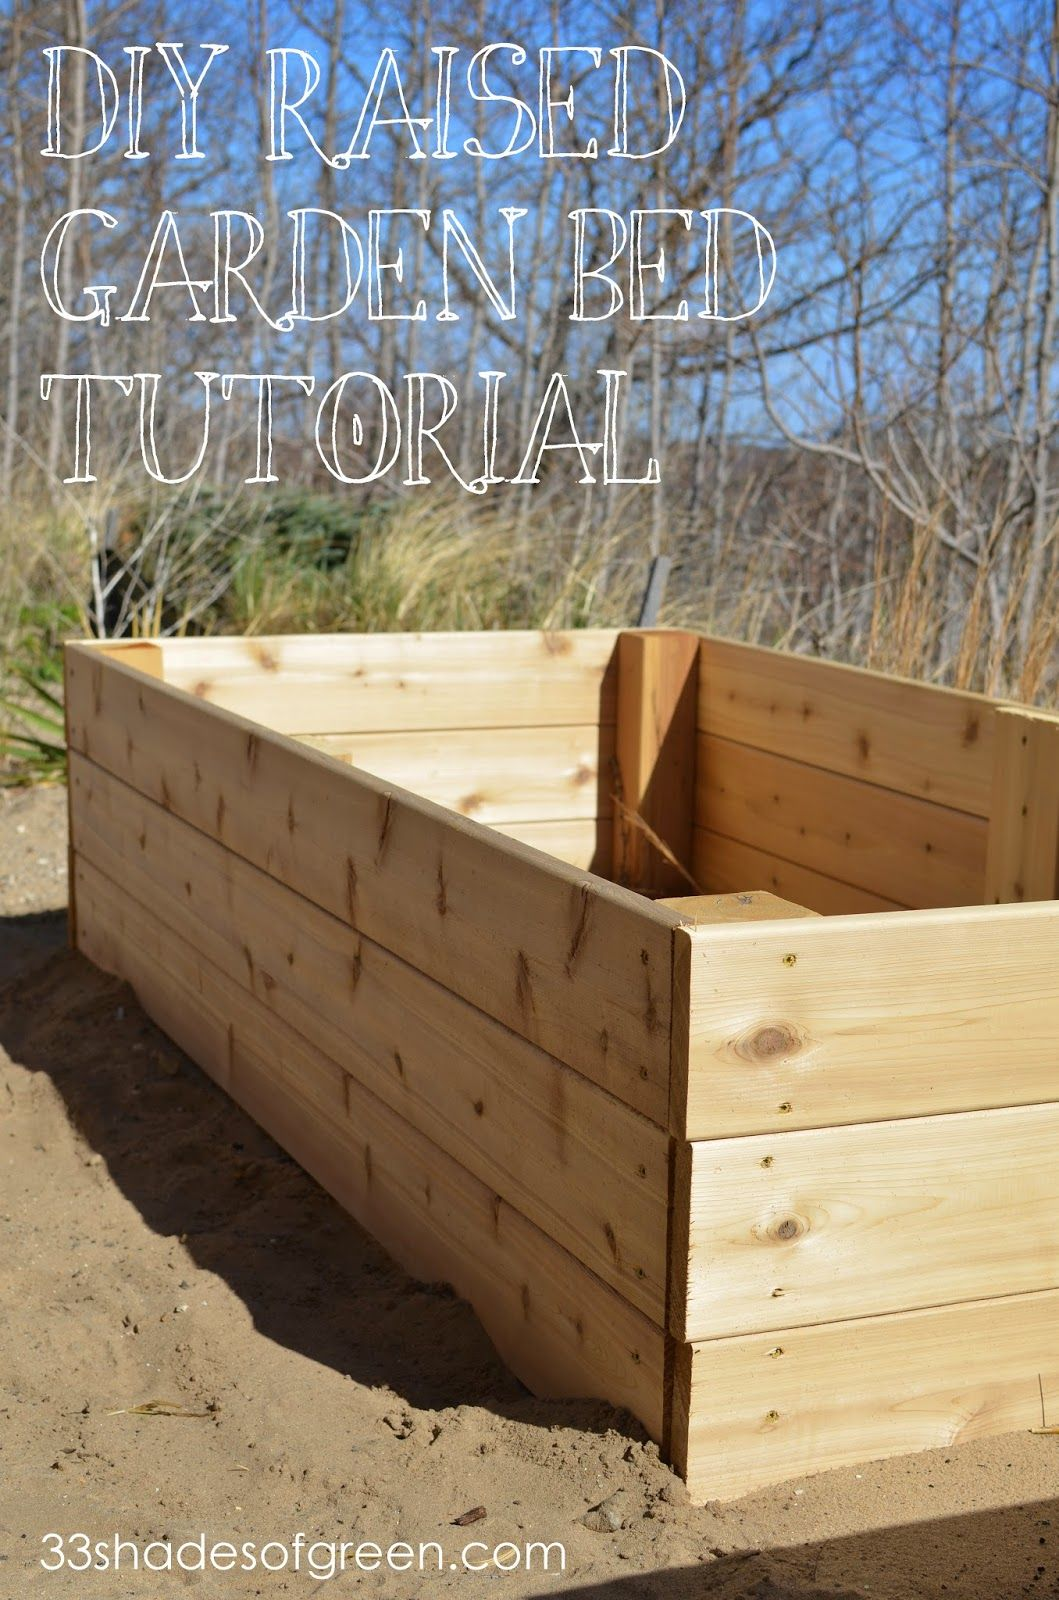 Easy DIY Raised Garden Bed Tutorial (33 Shades of Green) | Gardens ...